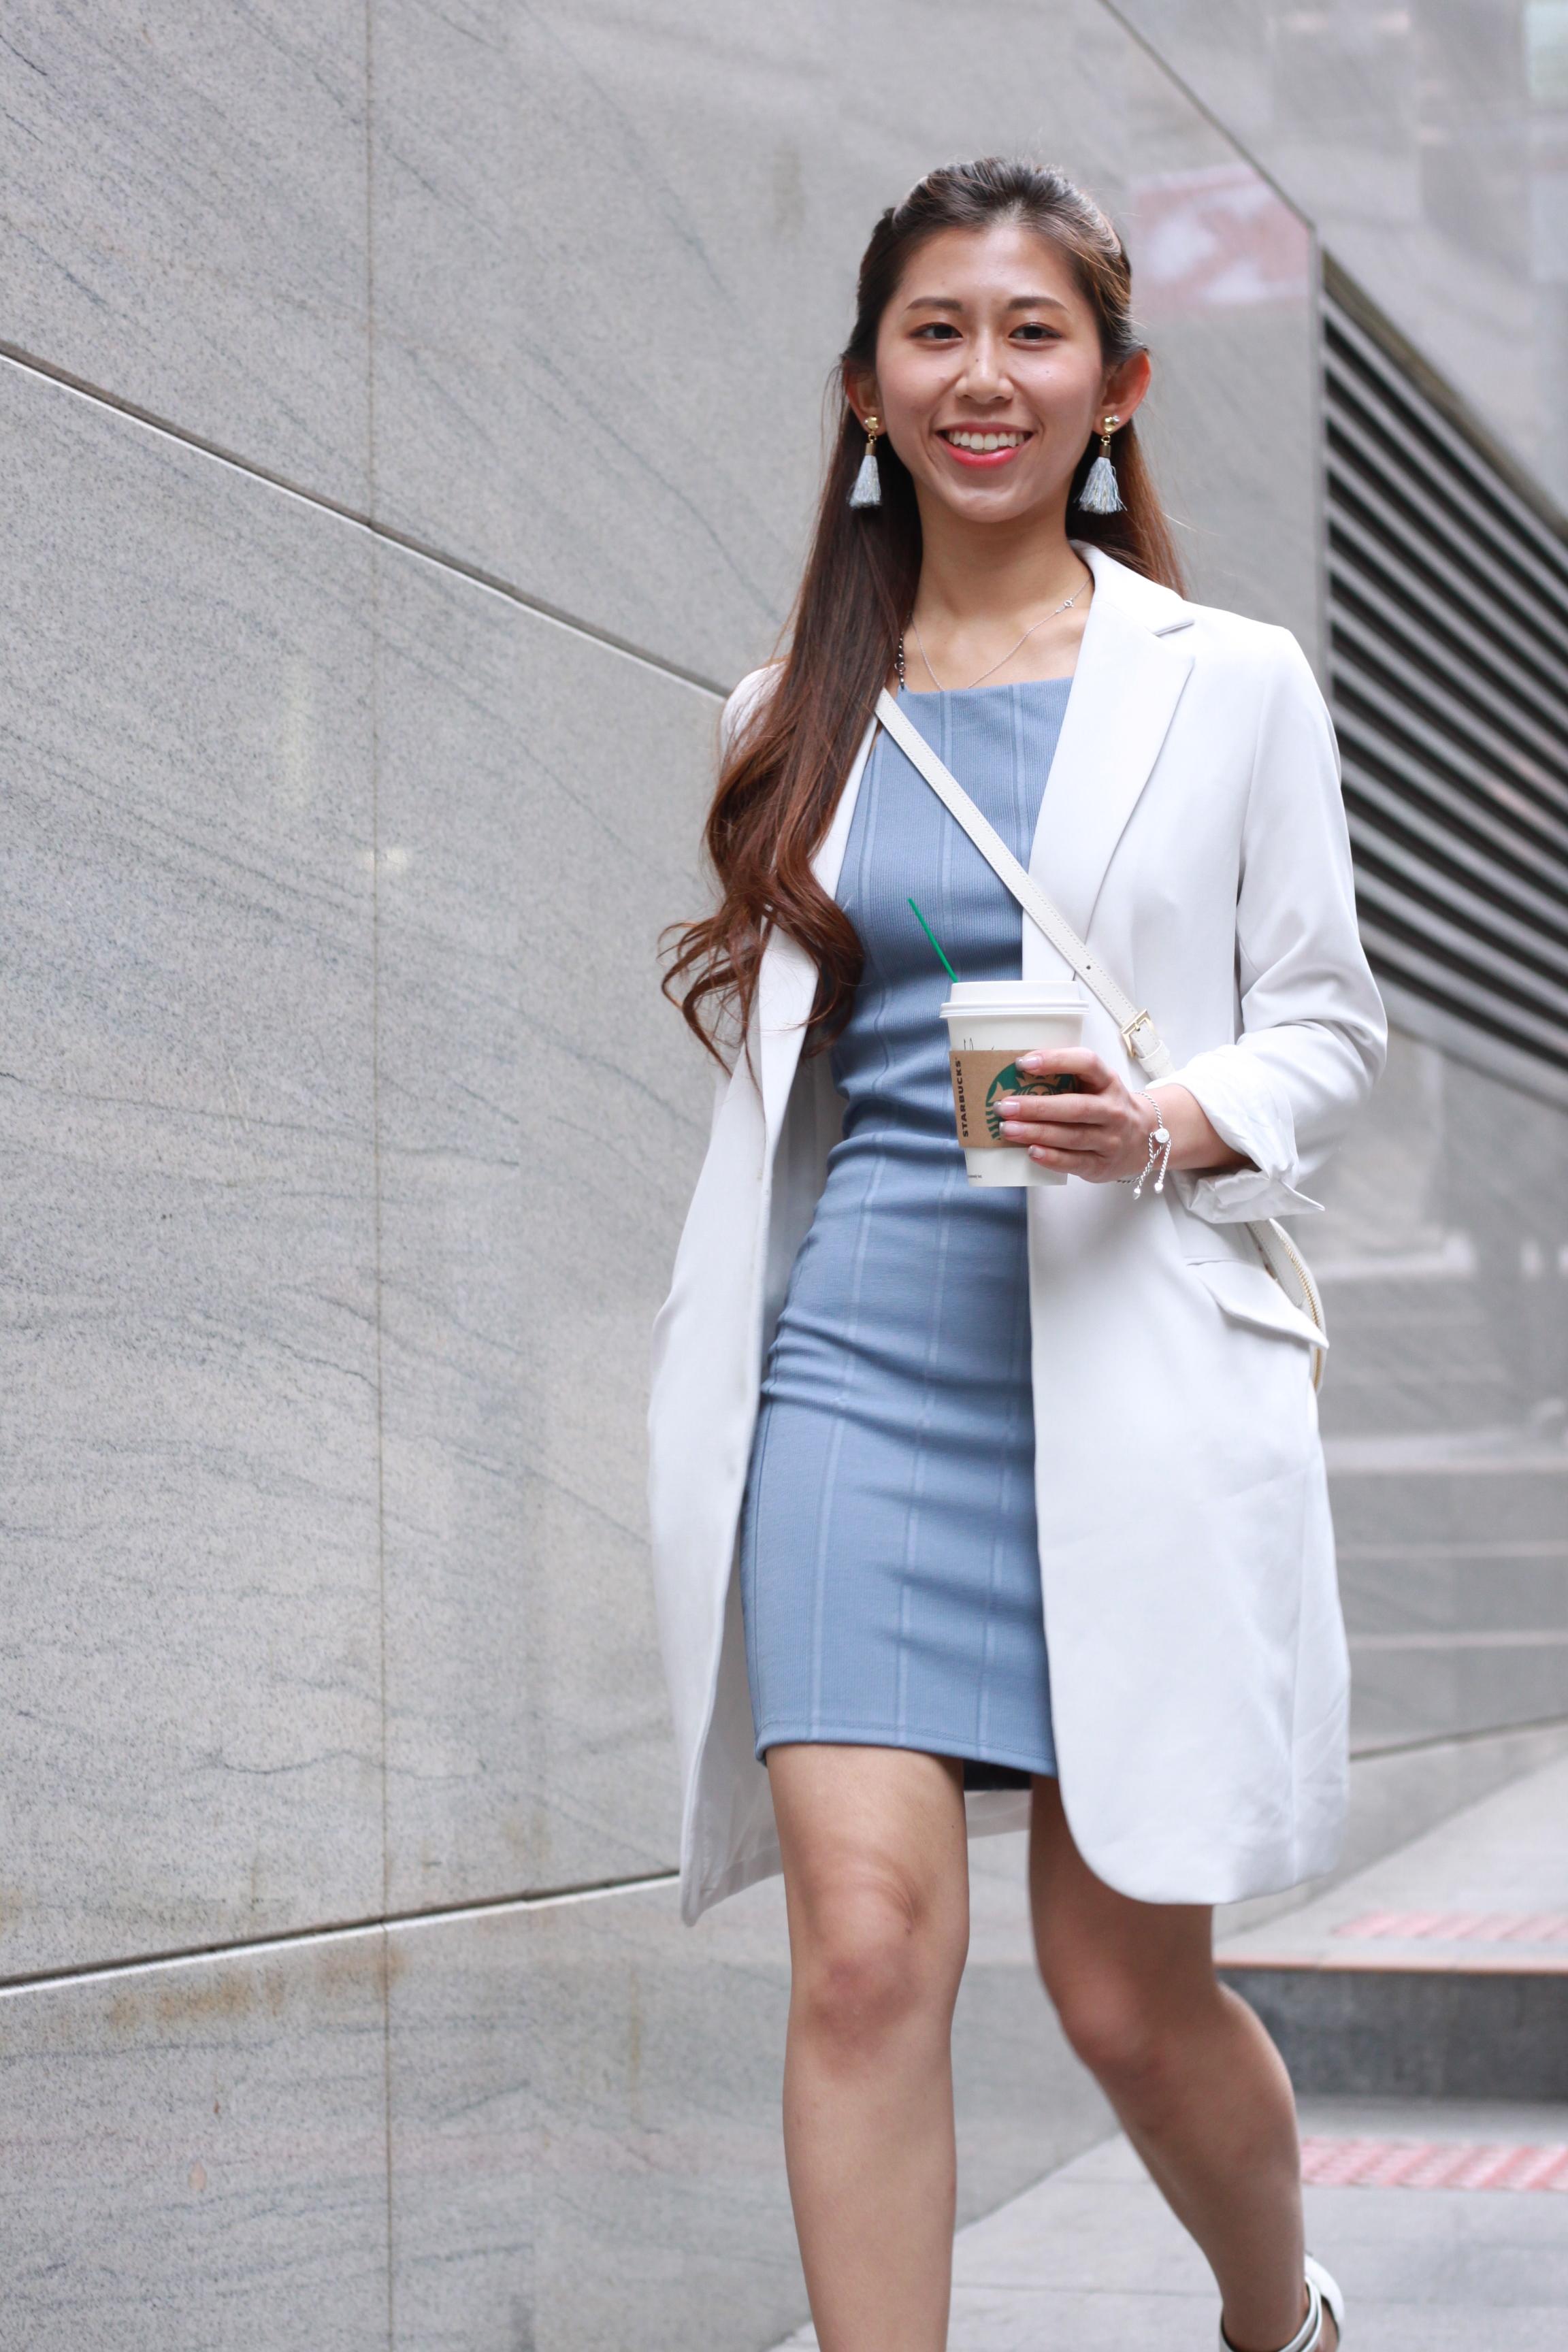 Topshop chain body con / White blazer from Japan / Rayethelabel white heels / Agnes b. white crossbag / DearPostman grey tassels earrings